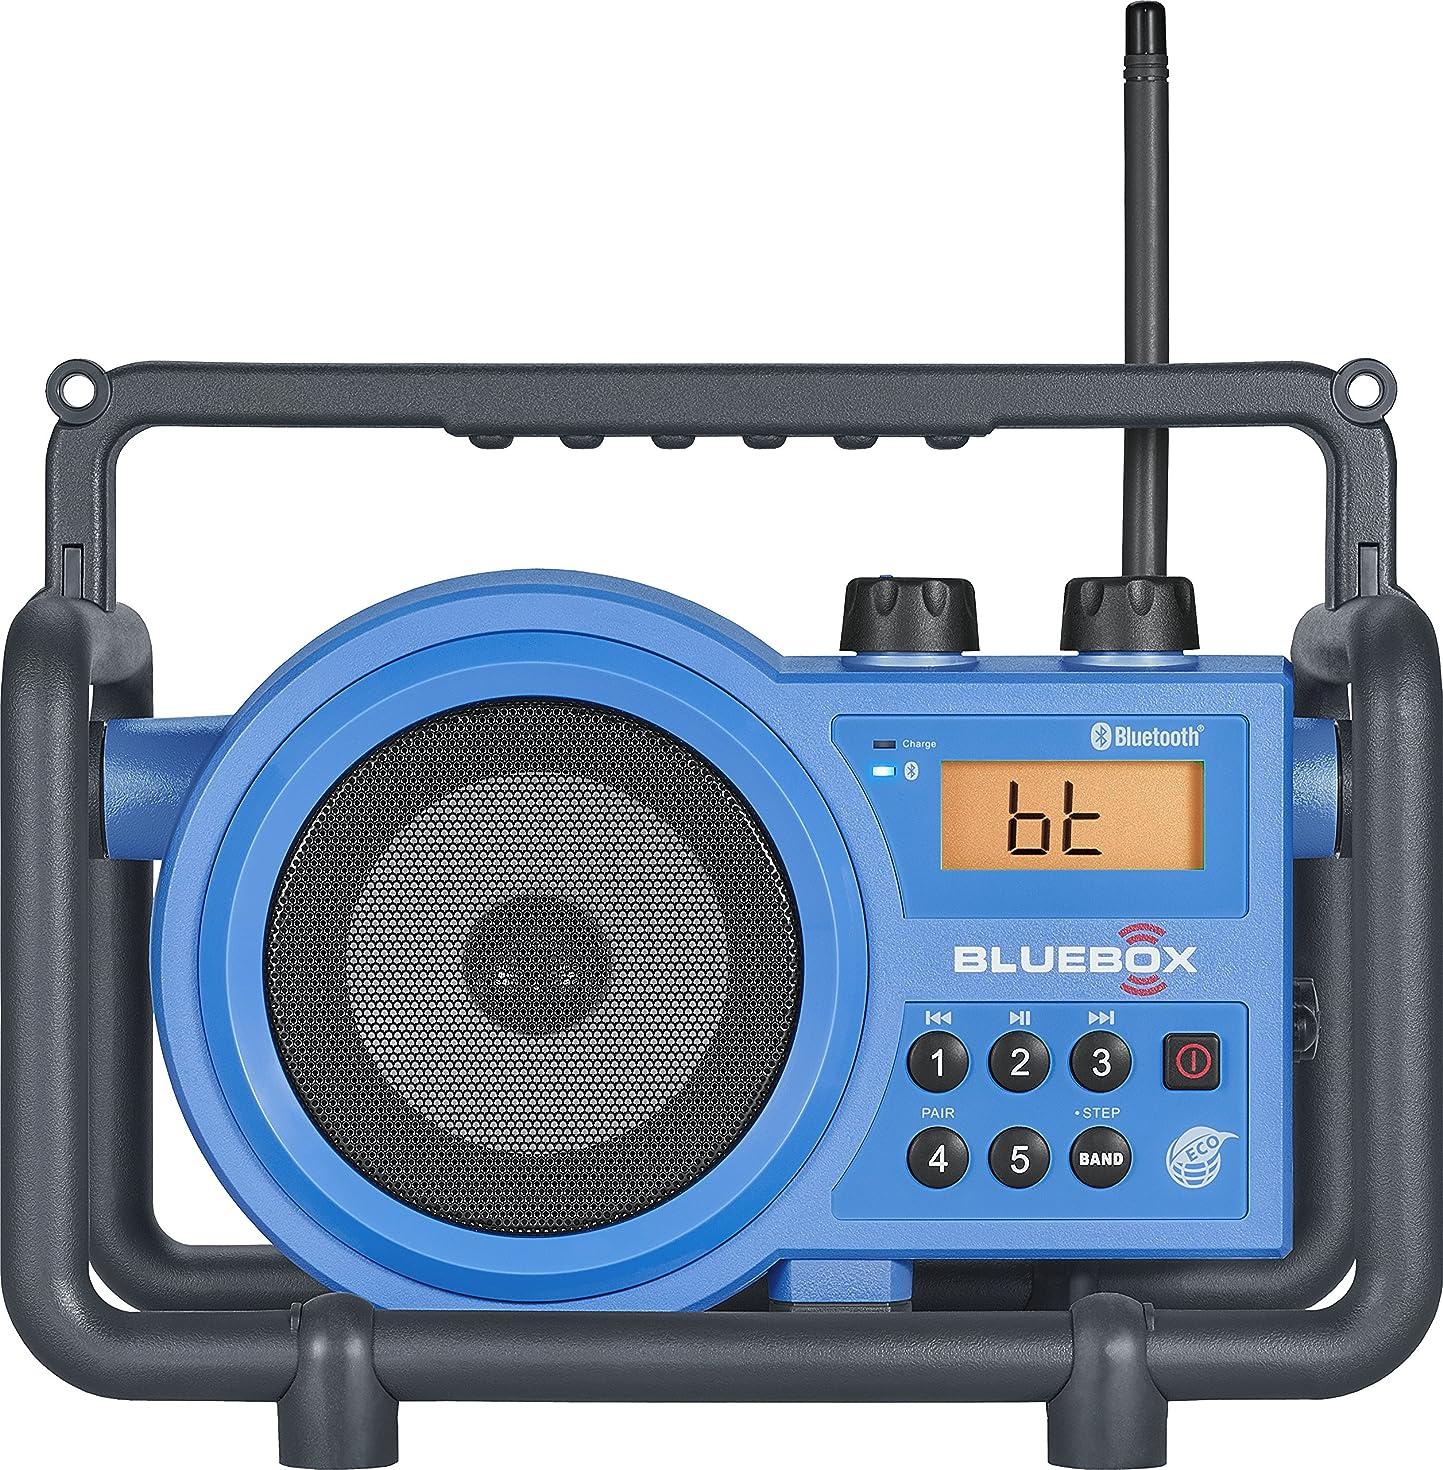 Sangean BB-100 AM/FM/Bluetooth/Aux-in Ultra Rugged Digital Tuning Rechargeable Radio